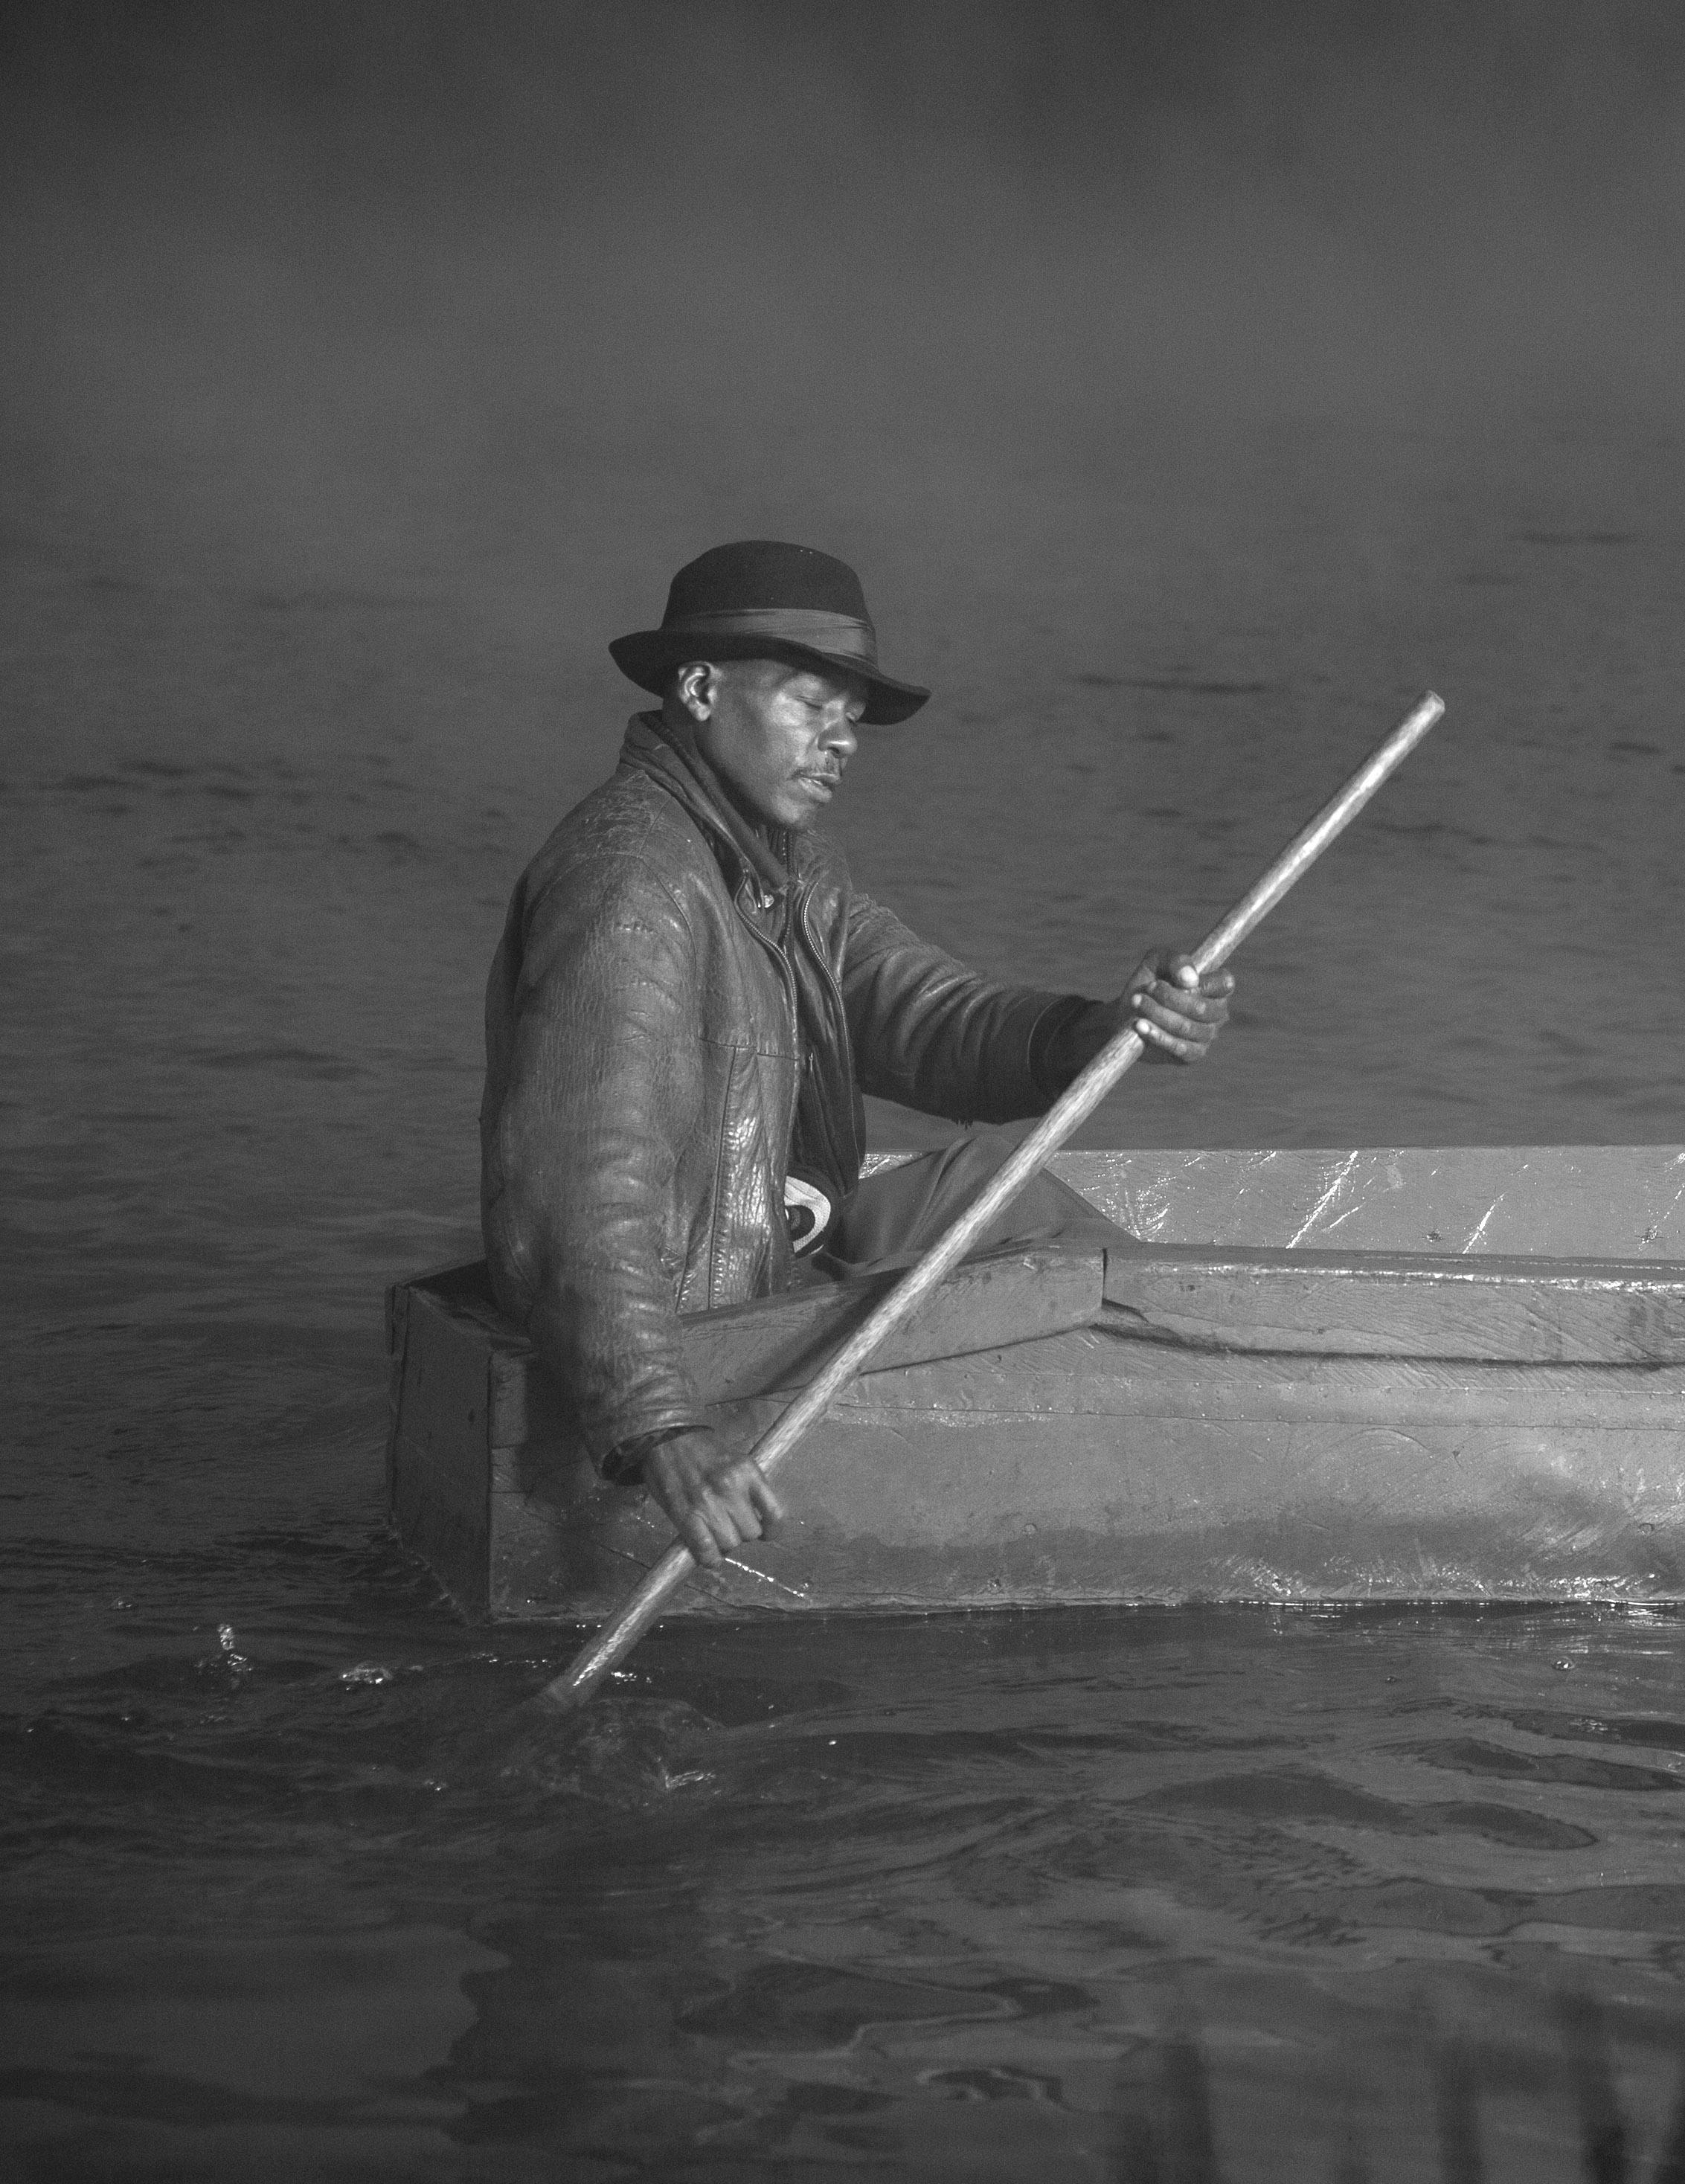 Mr. Kariuki, local fisherman